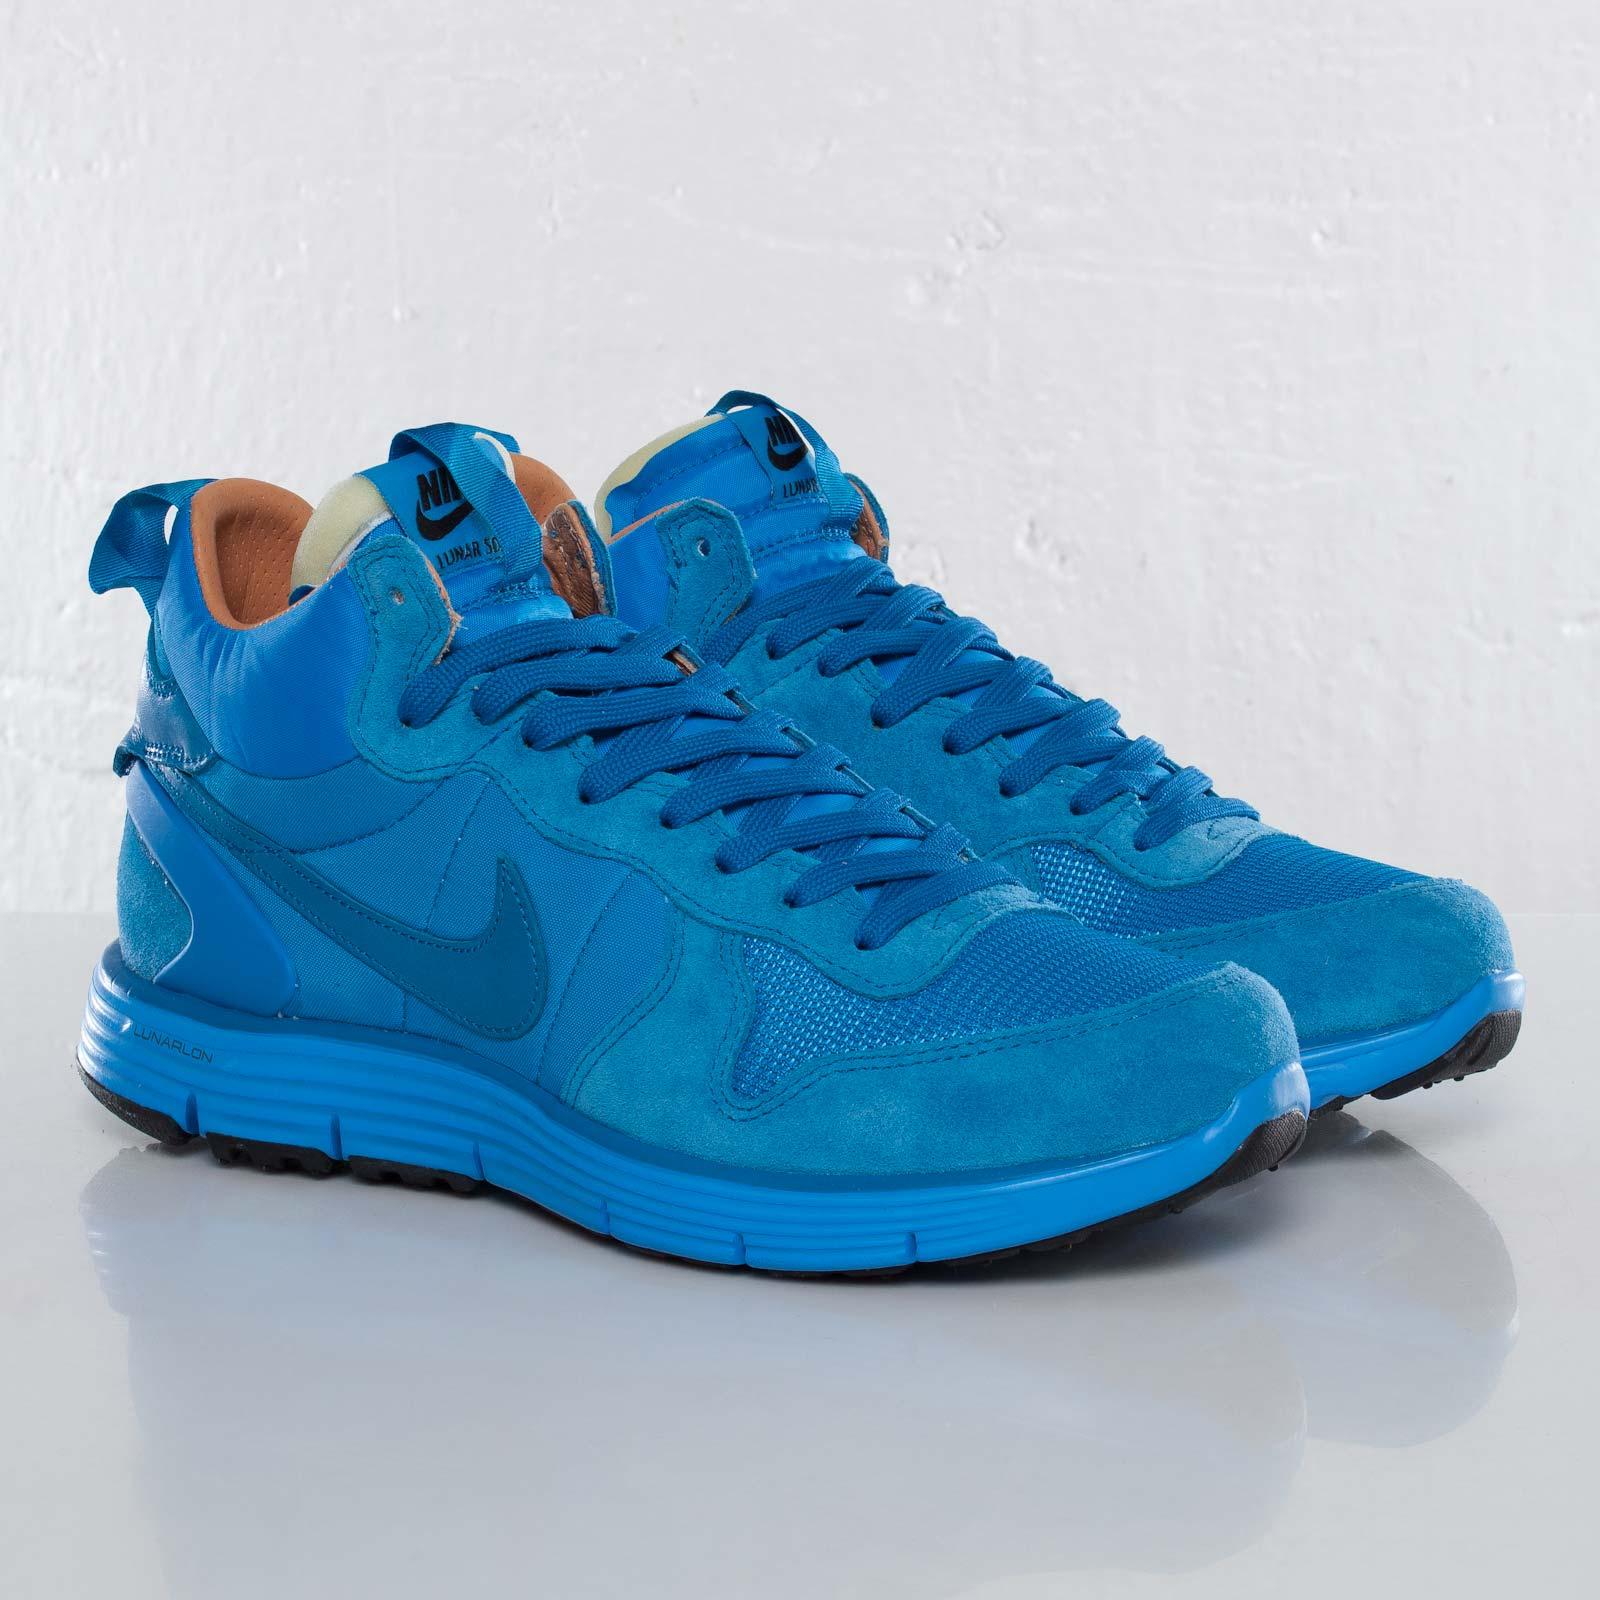 new product d2007 6c803 Nike Lunar Solstice Mid SP